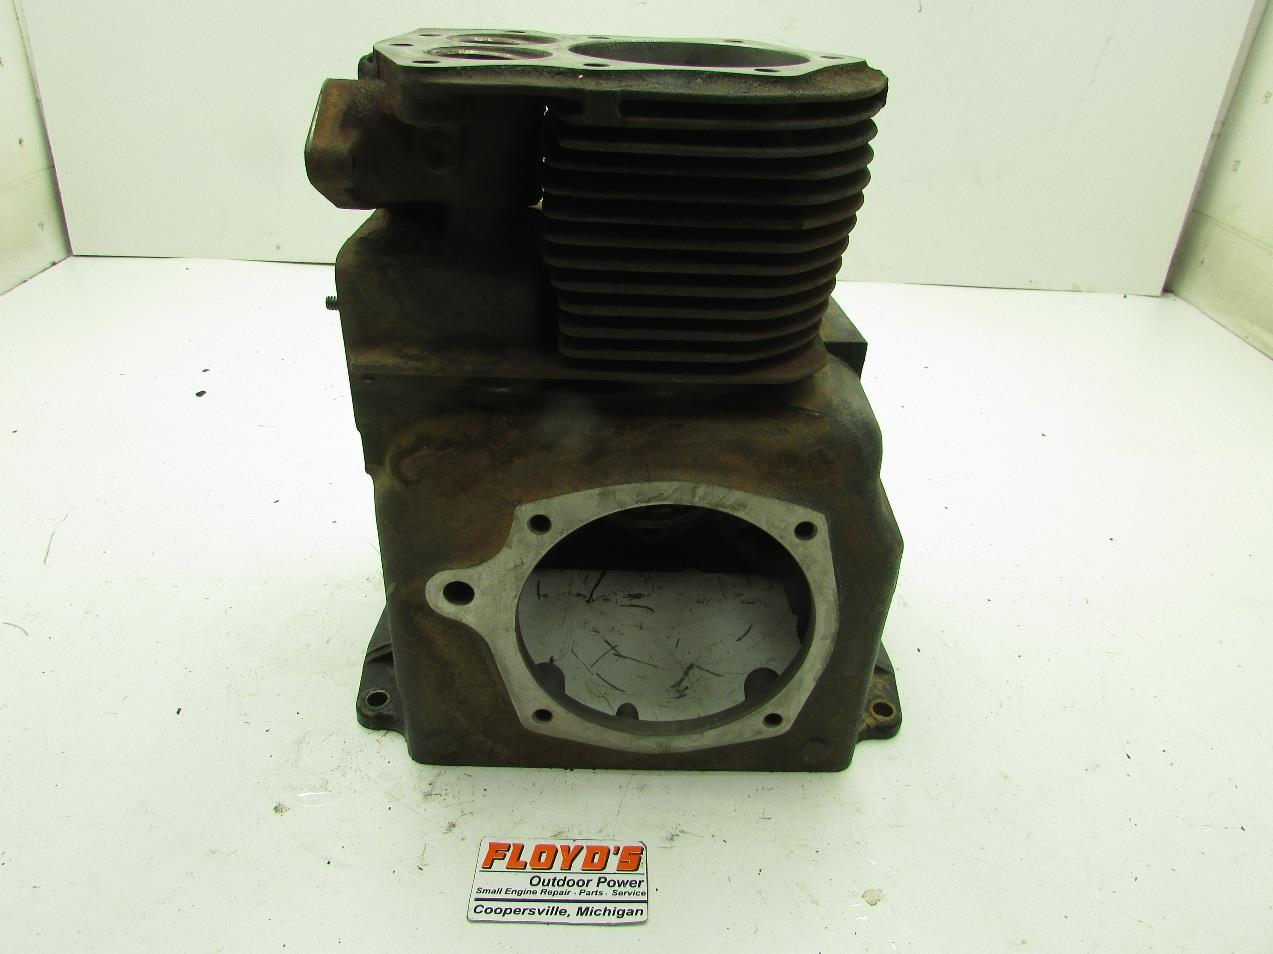 John Deere 314 Kohler Engine Engines Wiring Harness K321 Crankcase Cylinder Block Std Ebay